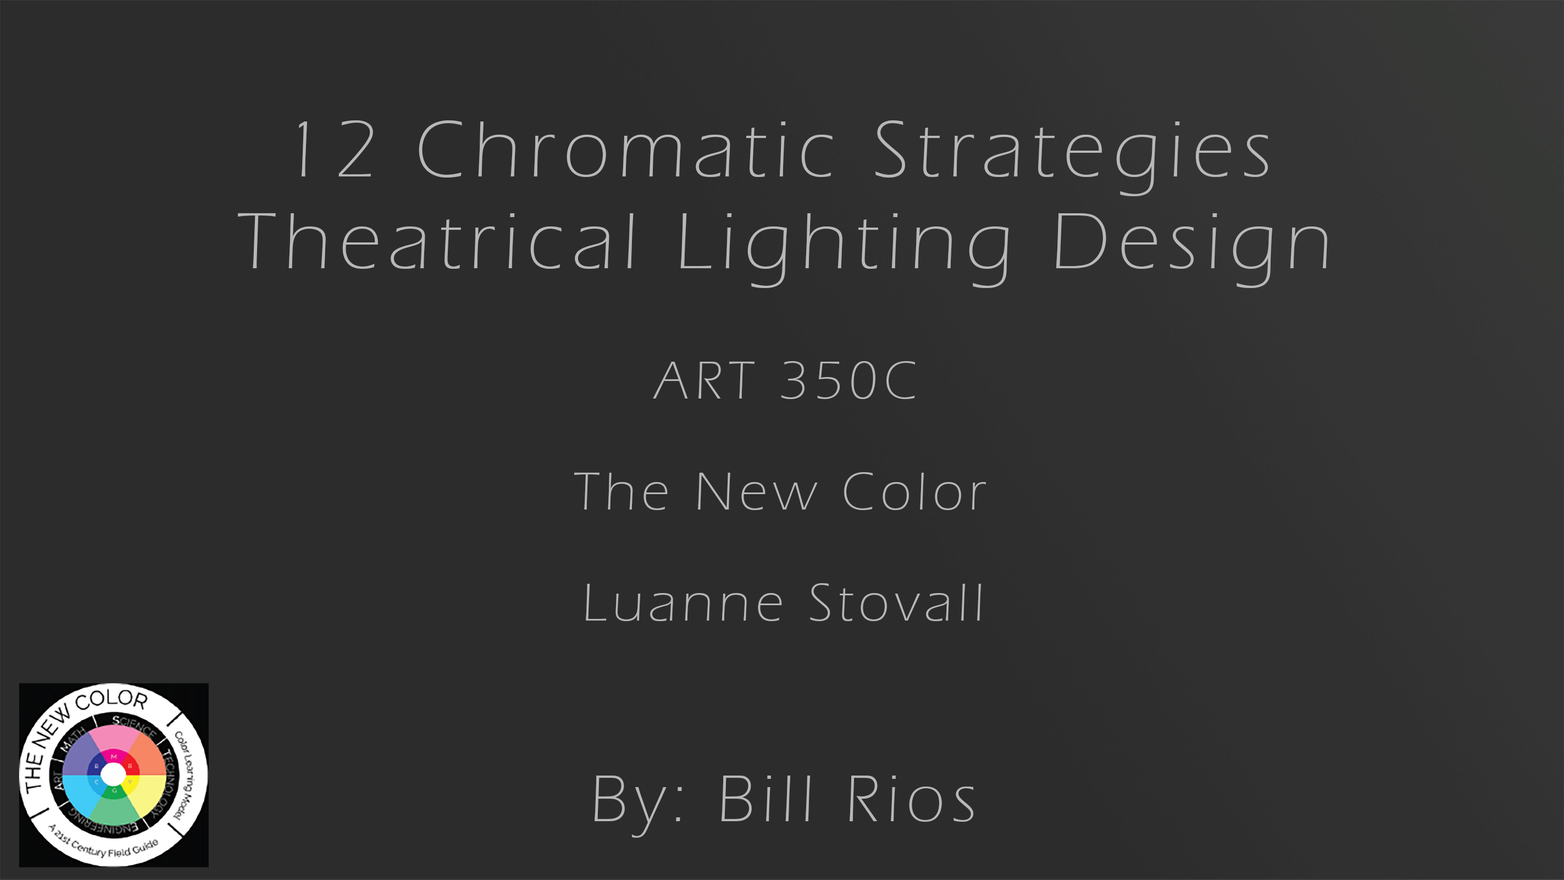 01-12-Chromatic-Strageties-Title-PageTit